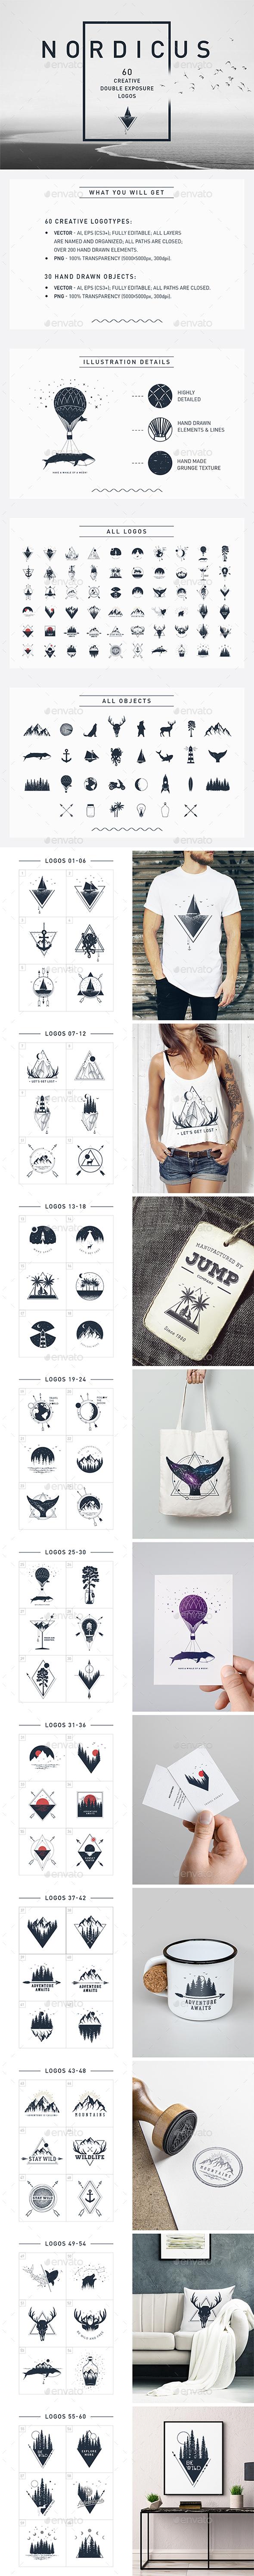 Nordicus. 60 Creative Logos - Badges & Stickers Web Elements